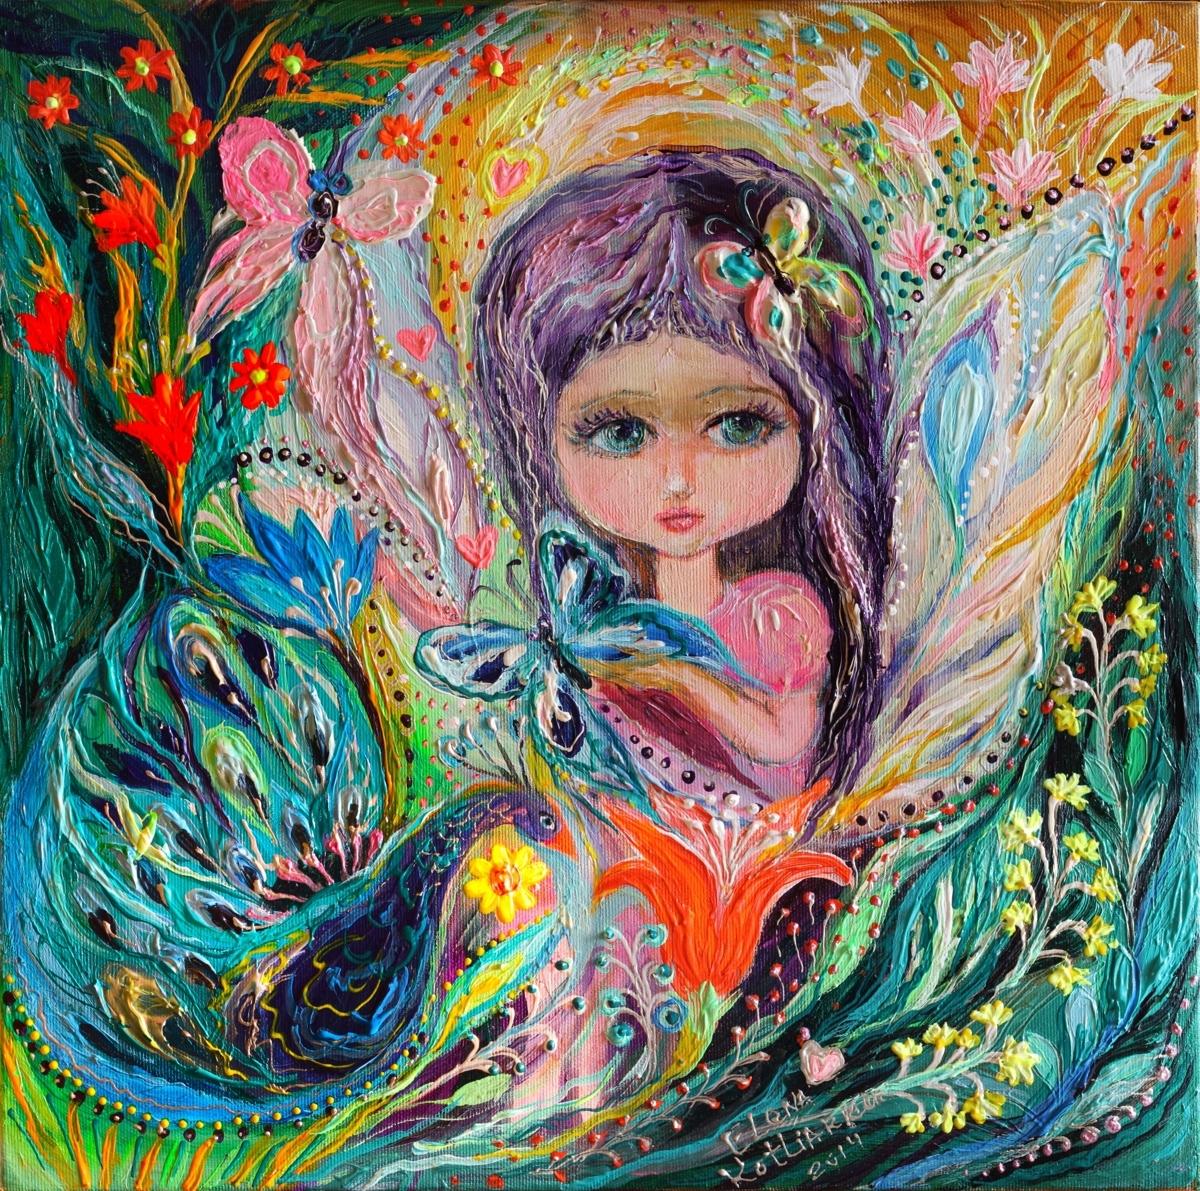 My little fairy Iris - superb quality giclee art print (large view)